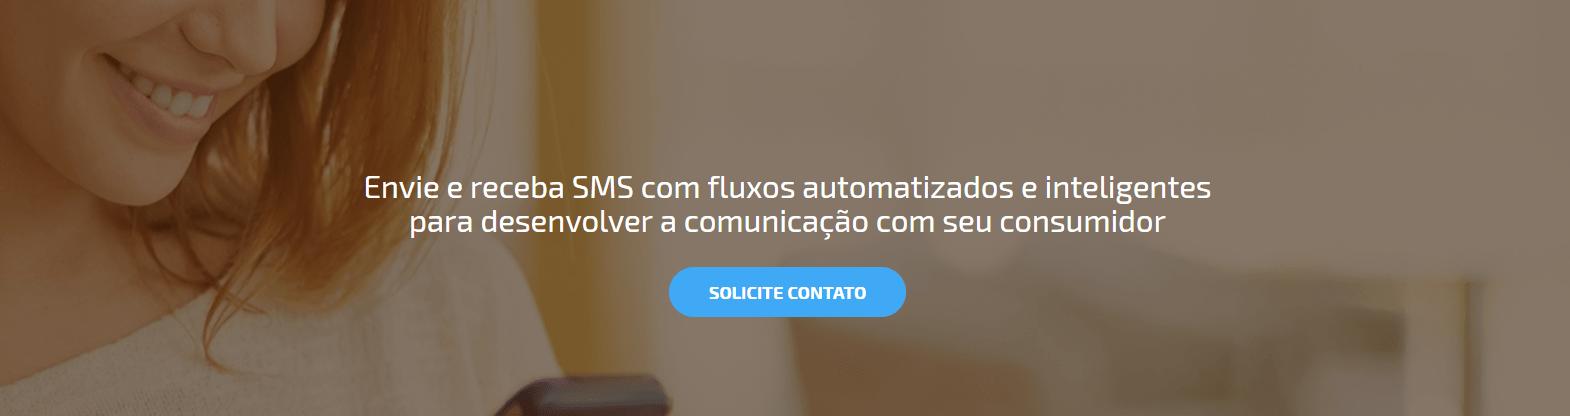 sms-zenvia-banner